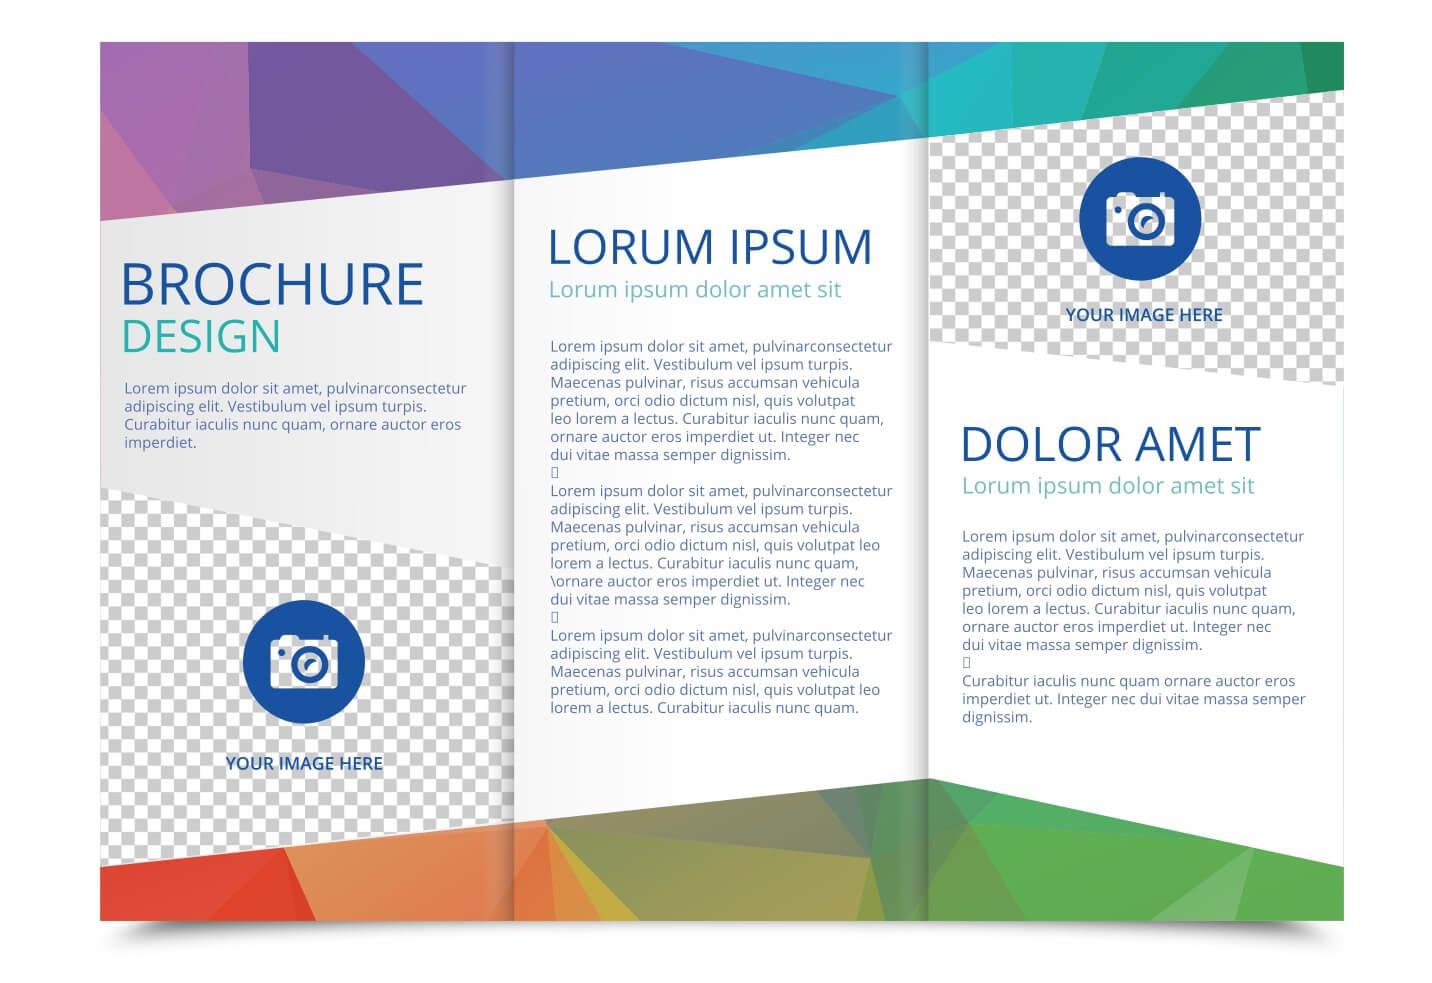 008 Free Tri Fold Template Ideas Brochure Astounding Tri Pertaining To Tri Fold Brochure Publisher Template